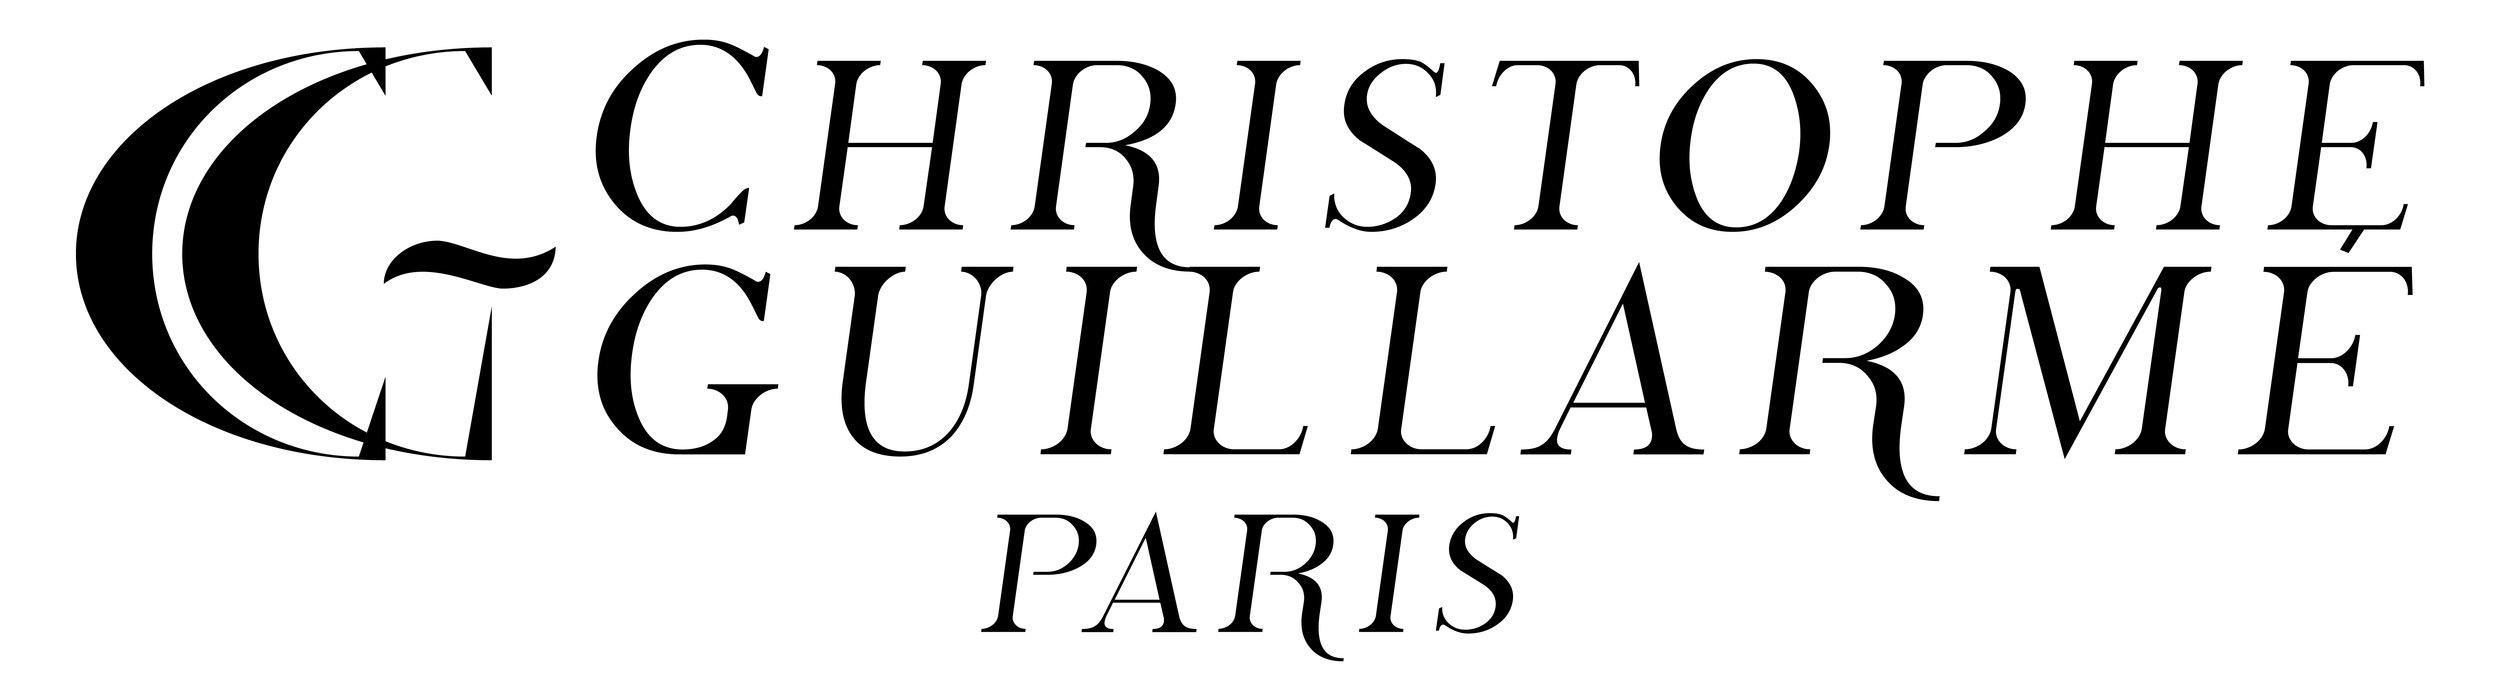 LOGO-Christophe_Guillarme_Paris_Logo_2015_784_2.jpg